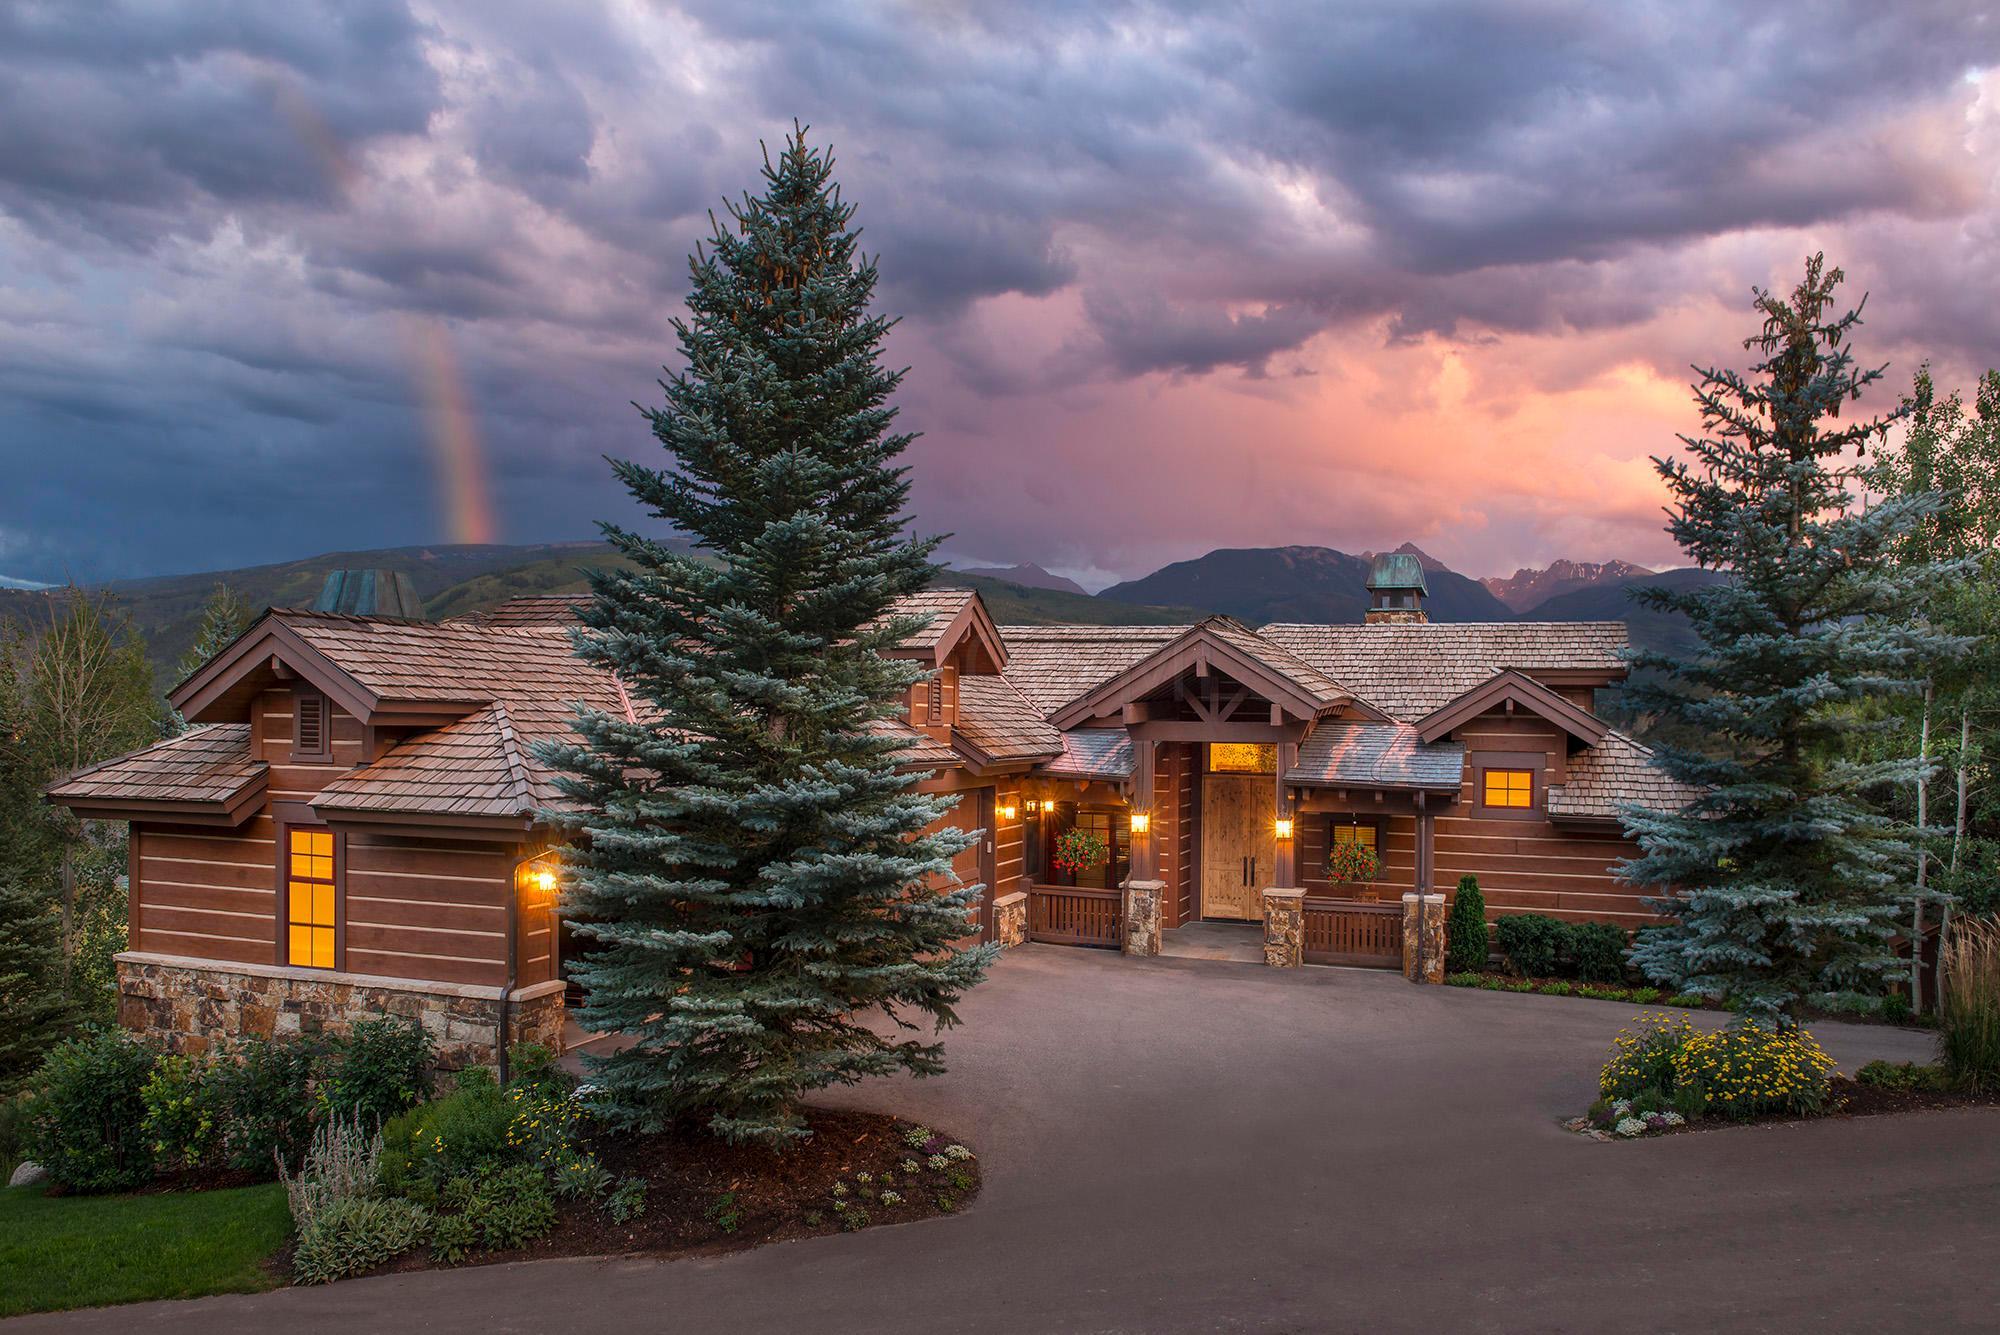 372 Legacy Trail, Edwards, CO 81632 Property Photo - Edwards, CO real estate listing